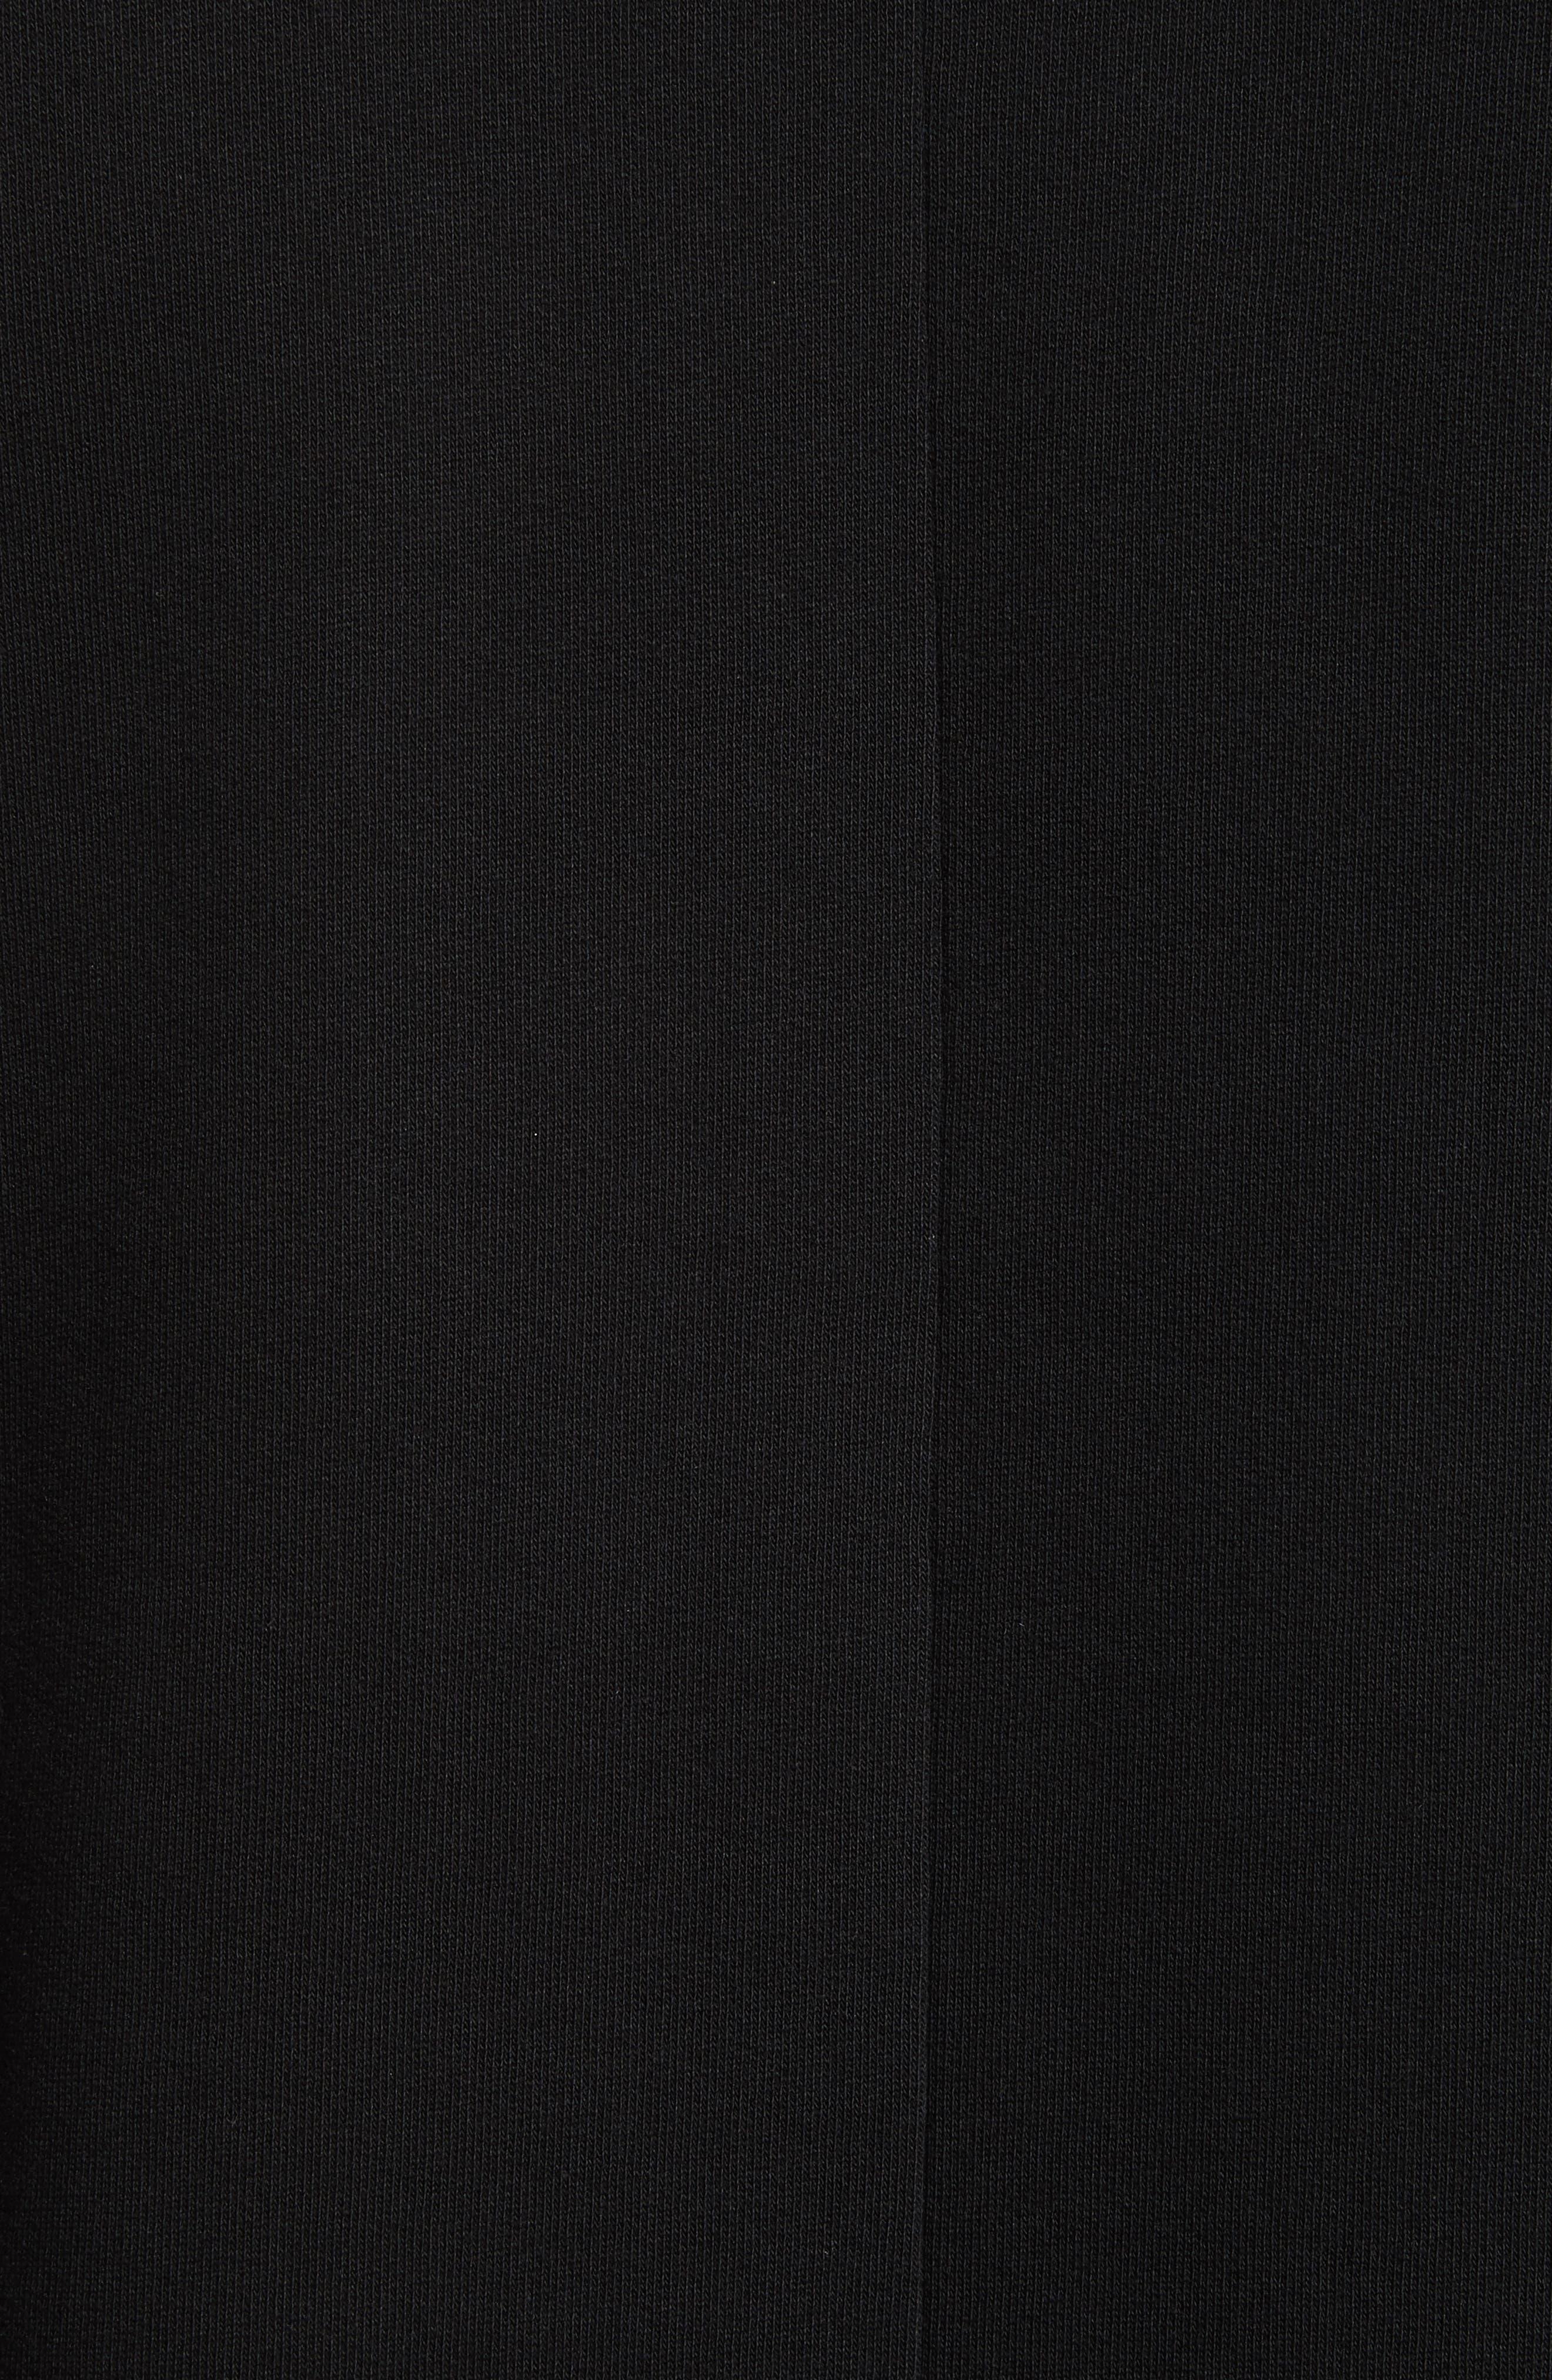 Flying Bands Crewneck Sweatshirt,                             Alternate thumbnail 5, color,                             Black